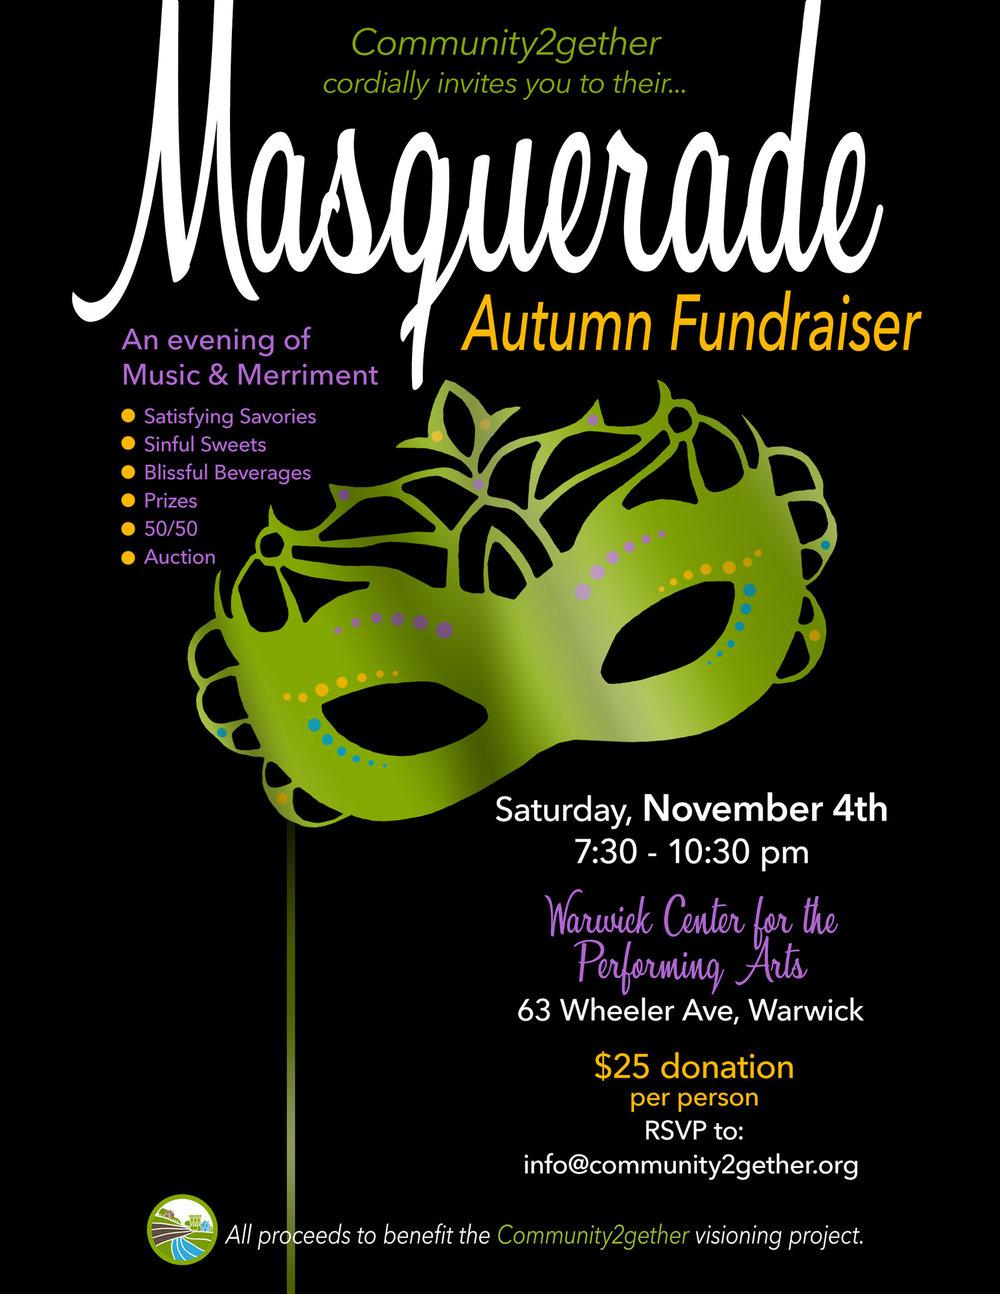 masquerade-Invitation-black-EMAIL.jpg